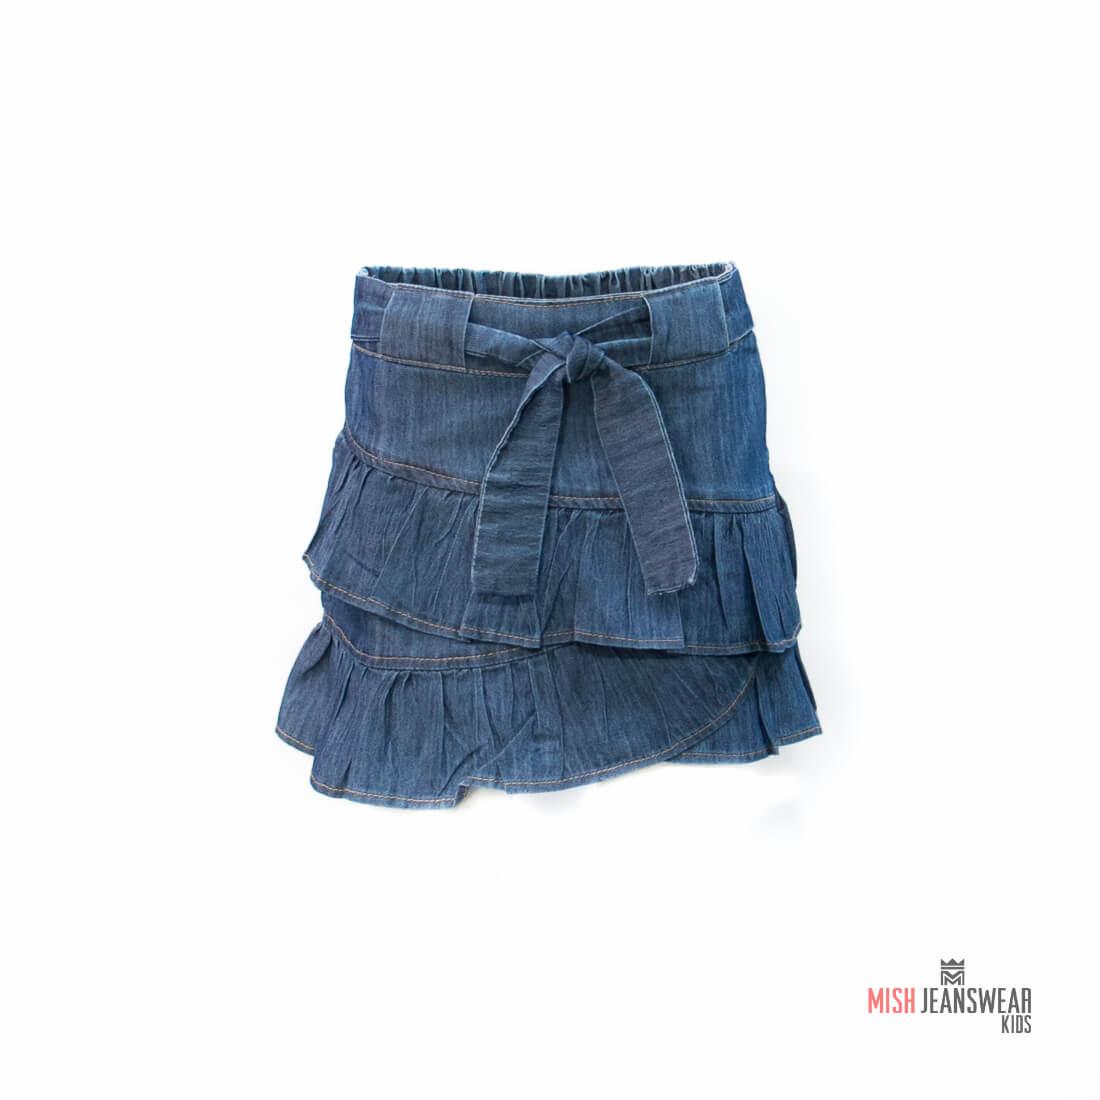 Saia jeans infantil com babado Mish feminina